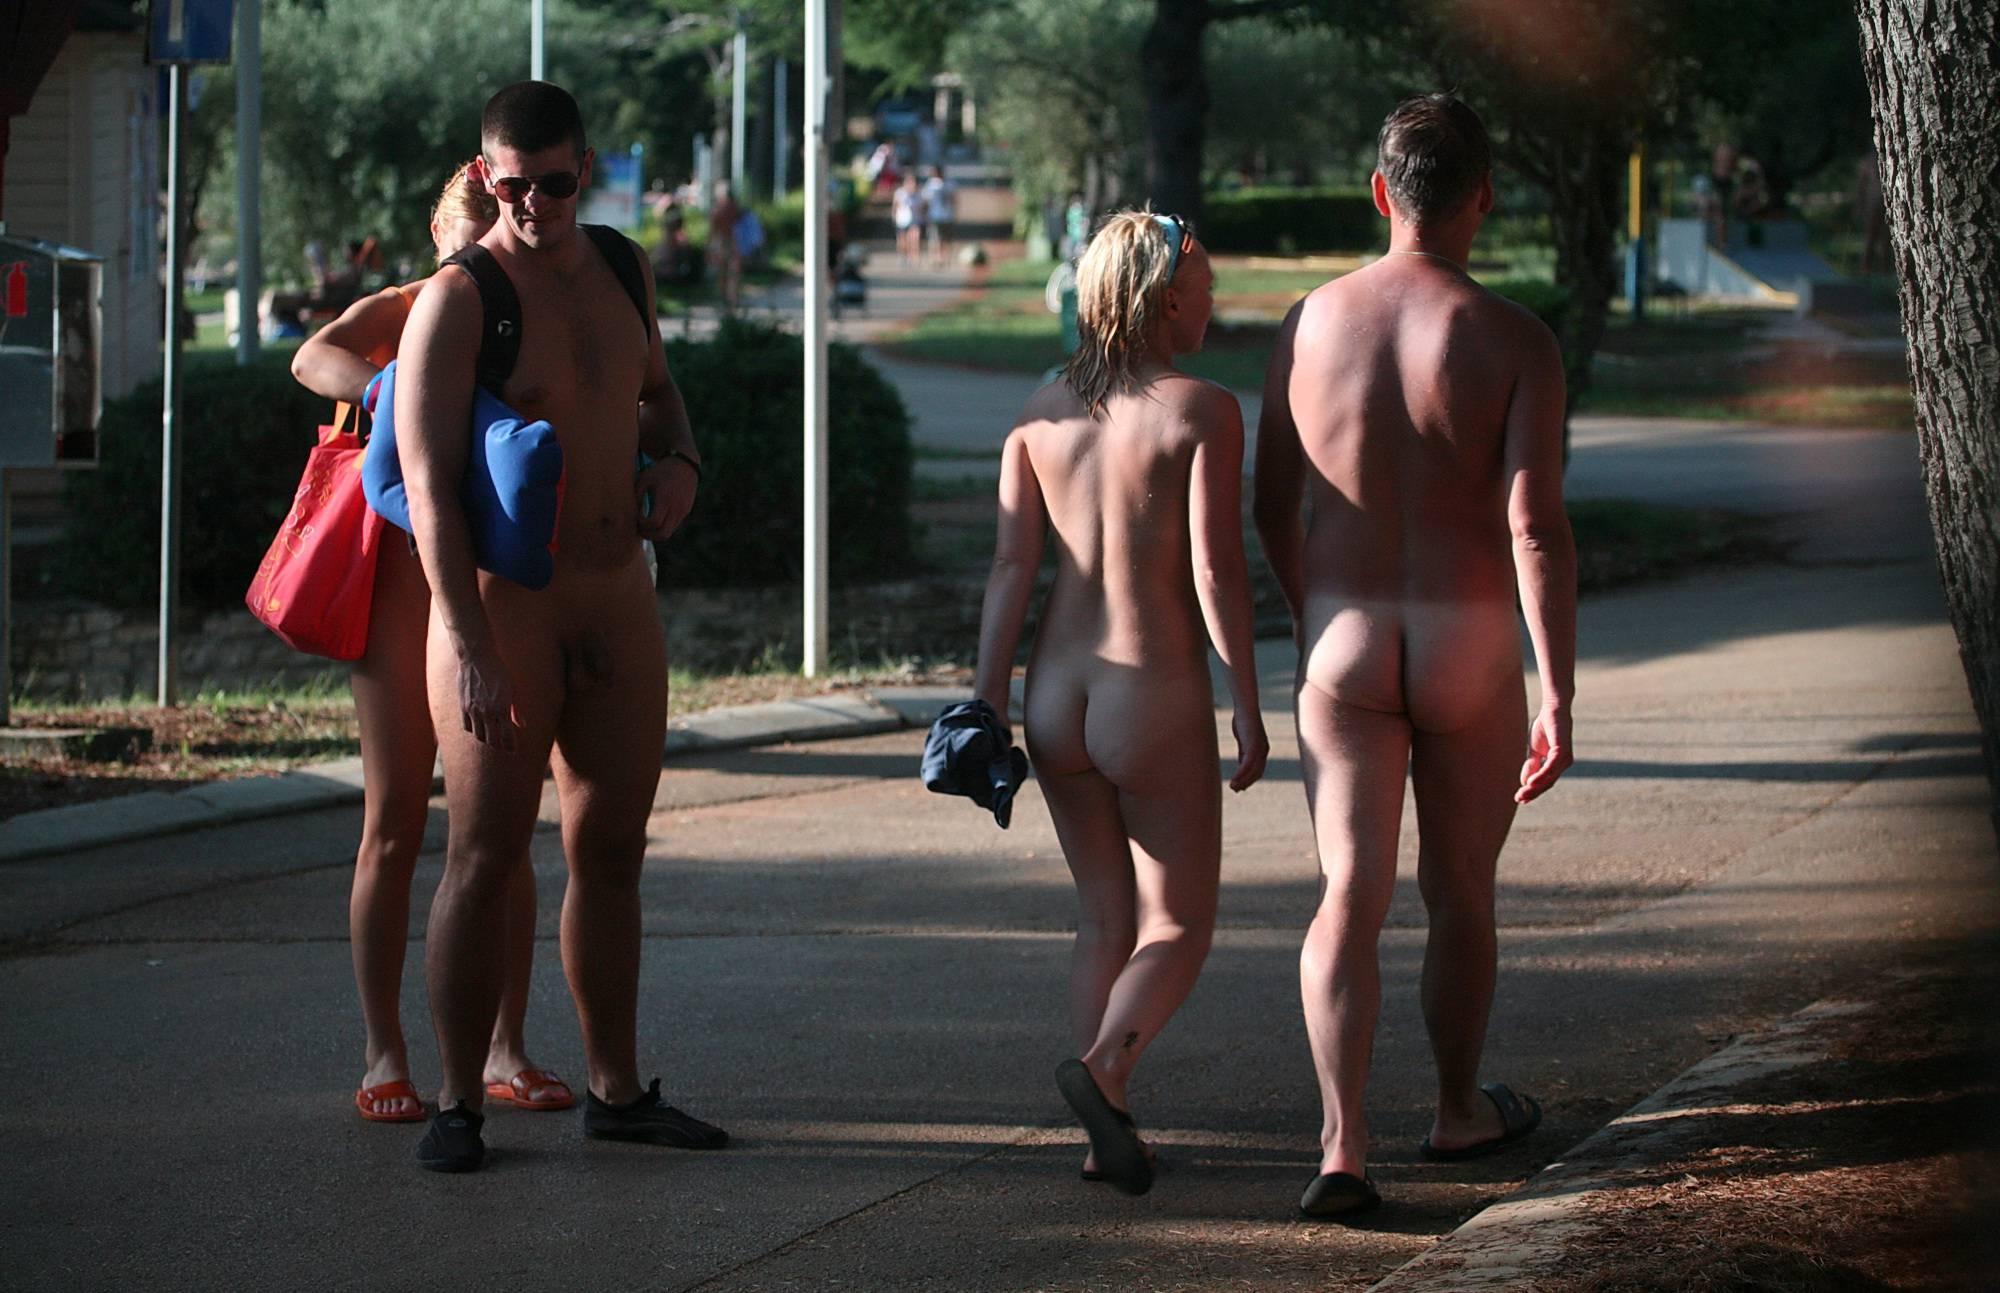 Nudist Photos Park and Mini Golf Series - 2